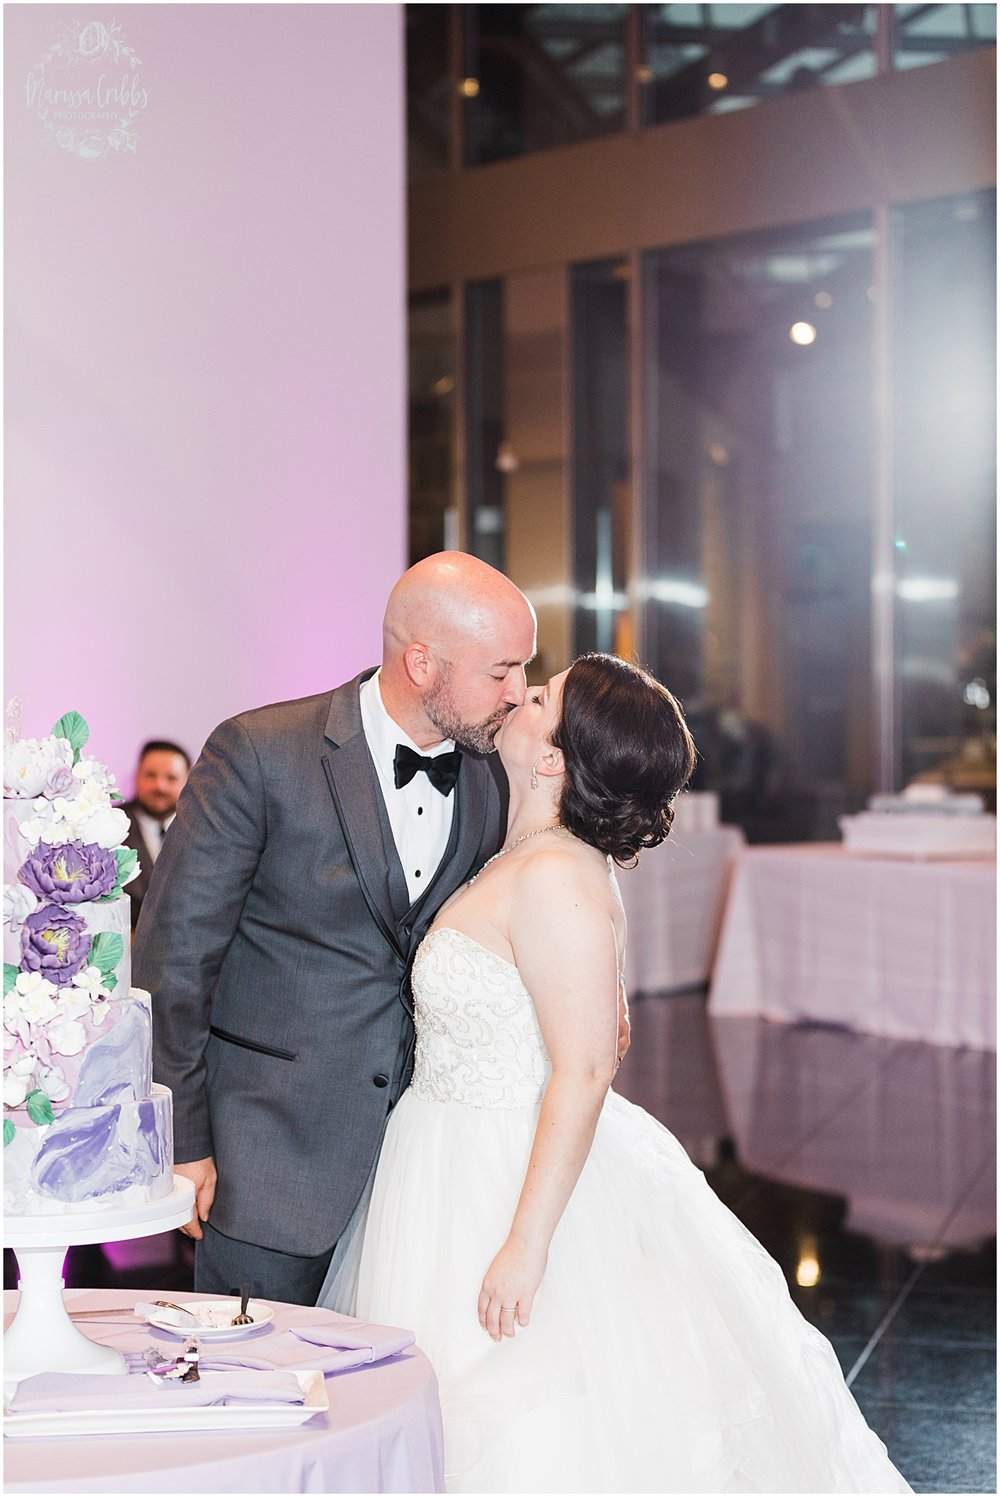 LAURA & DAN MARRIED | NELSON ATKINS MUSEUM | MARISSA CRIBBS PHOTOGRAPHY_7031.jpg